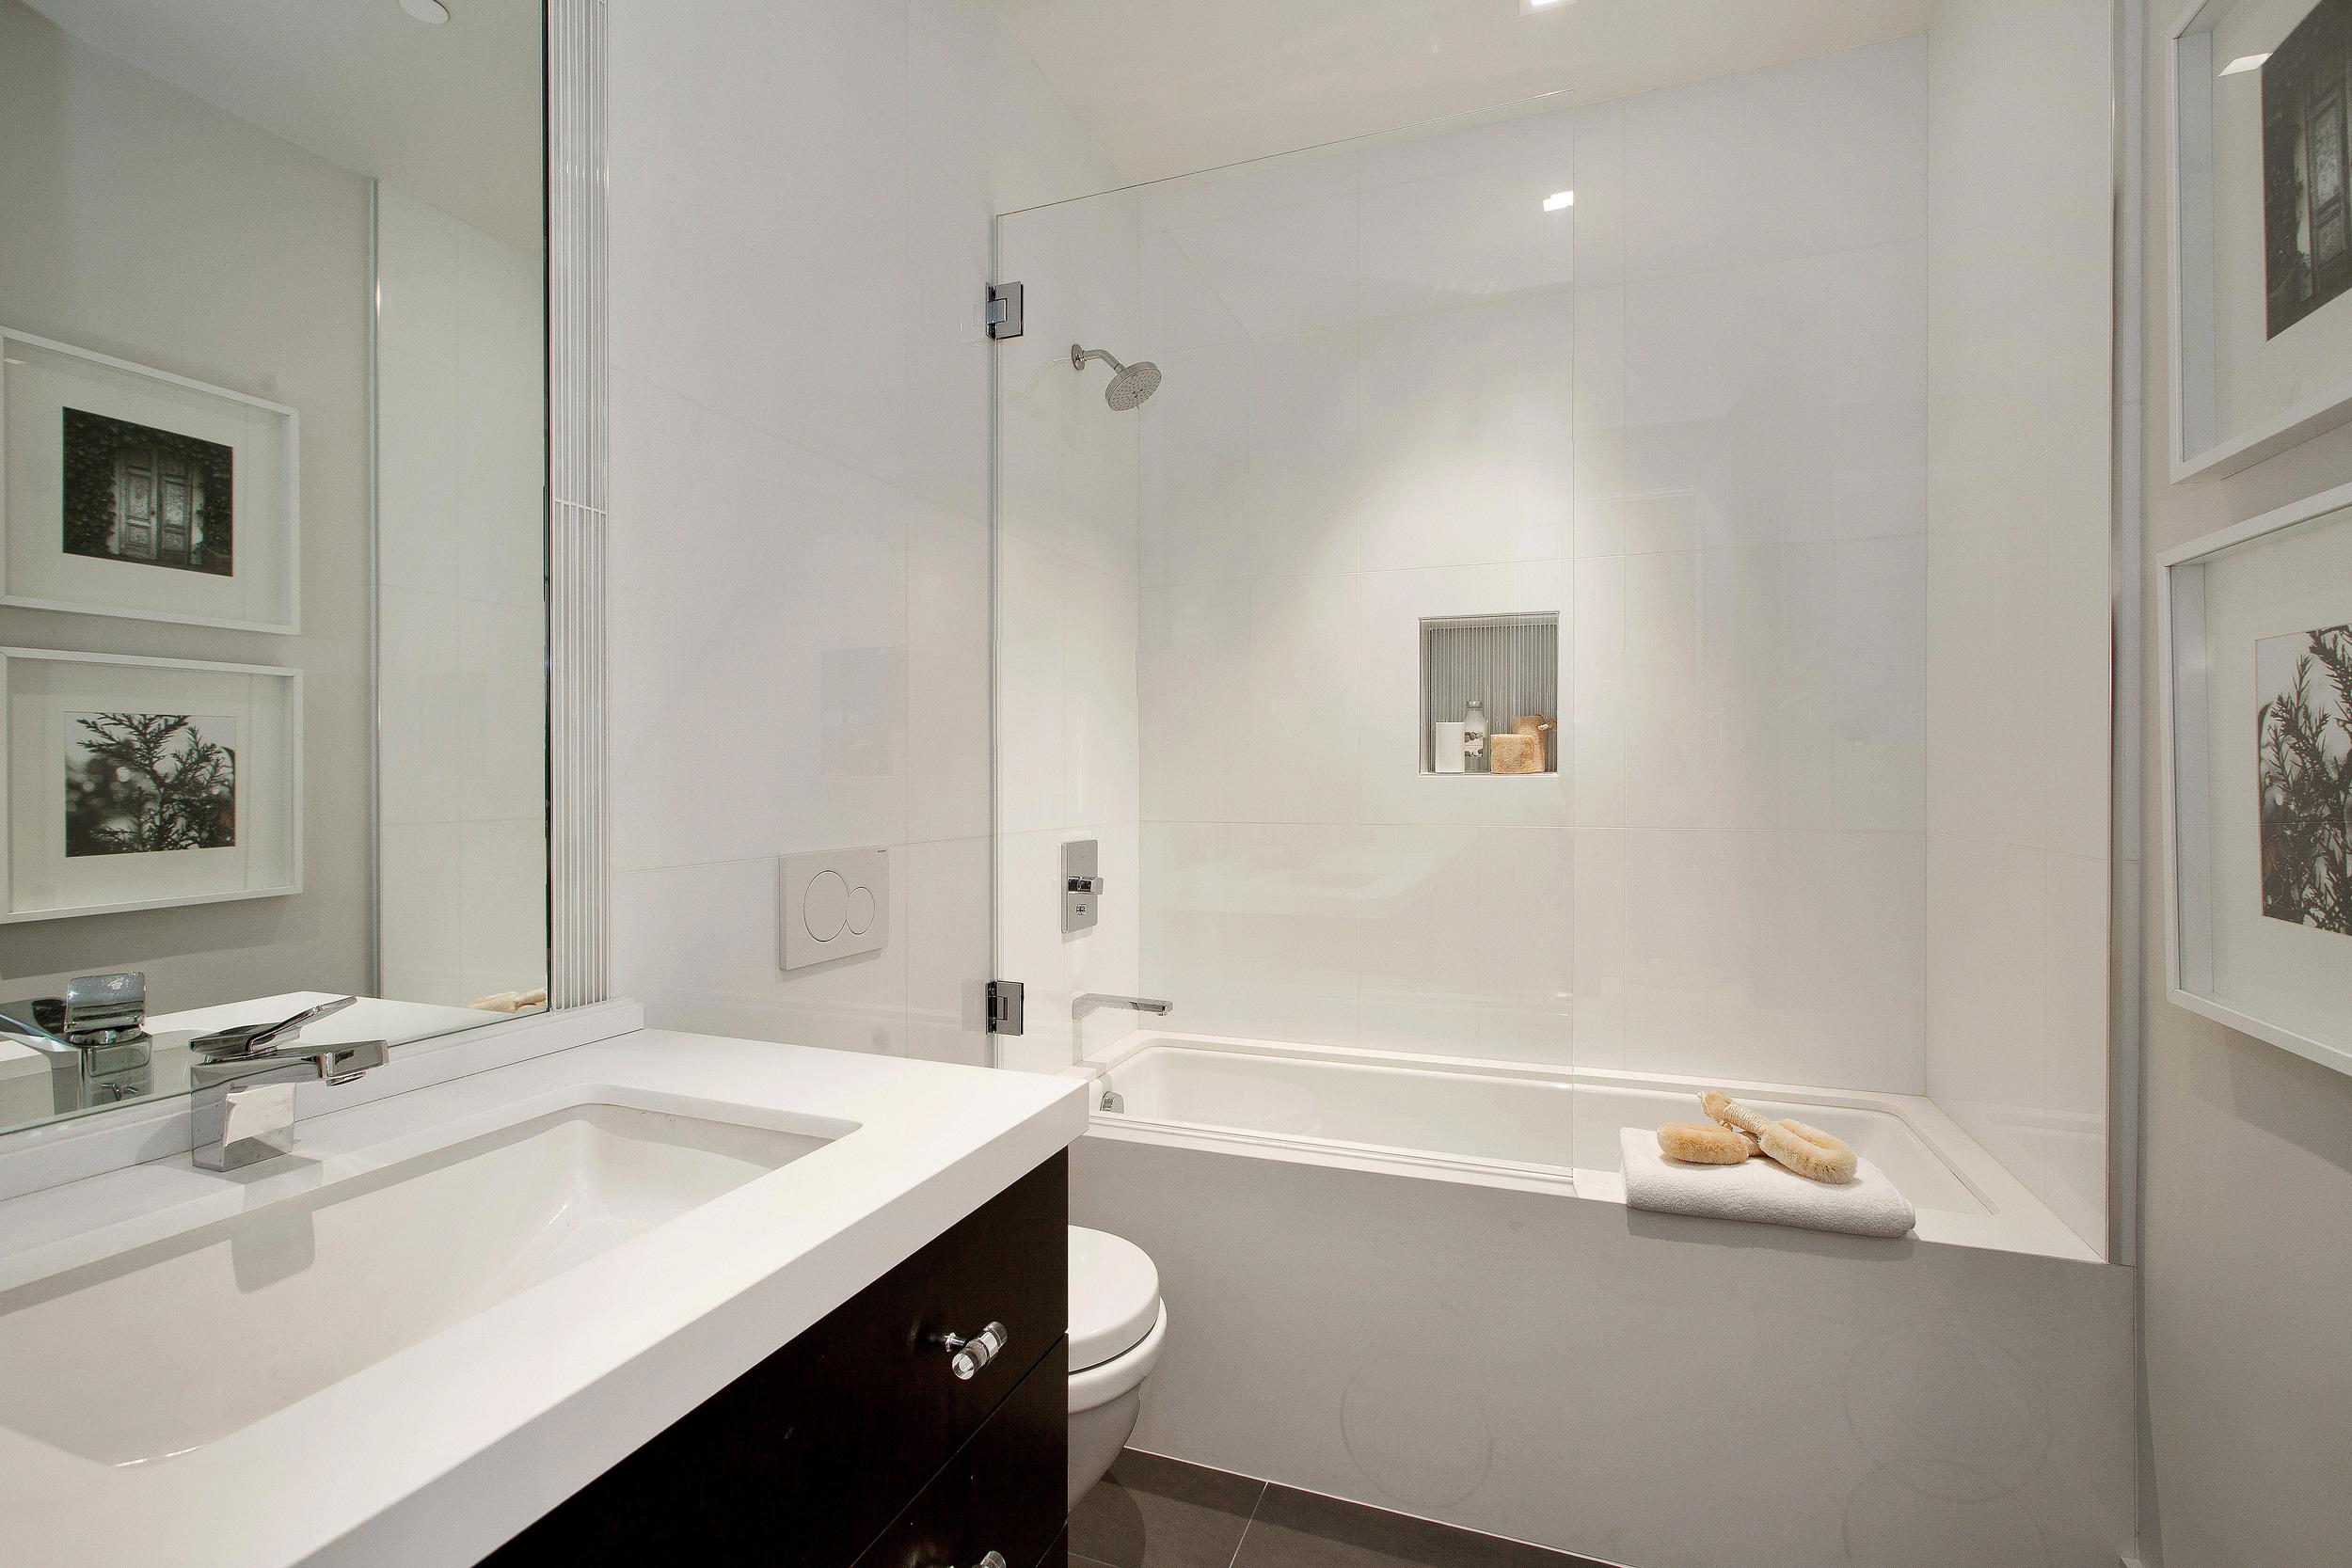 Bath screen and mirror